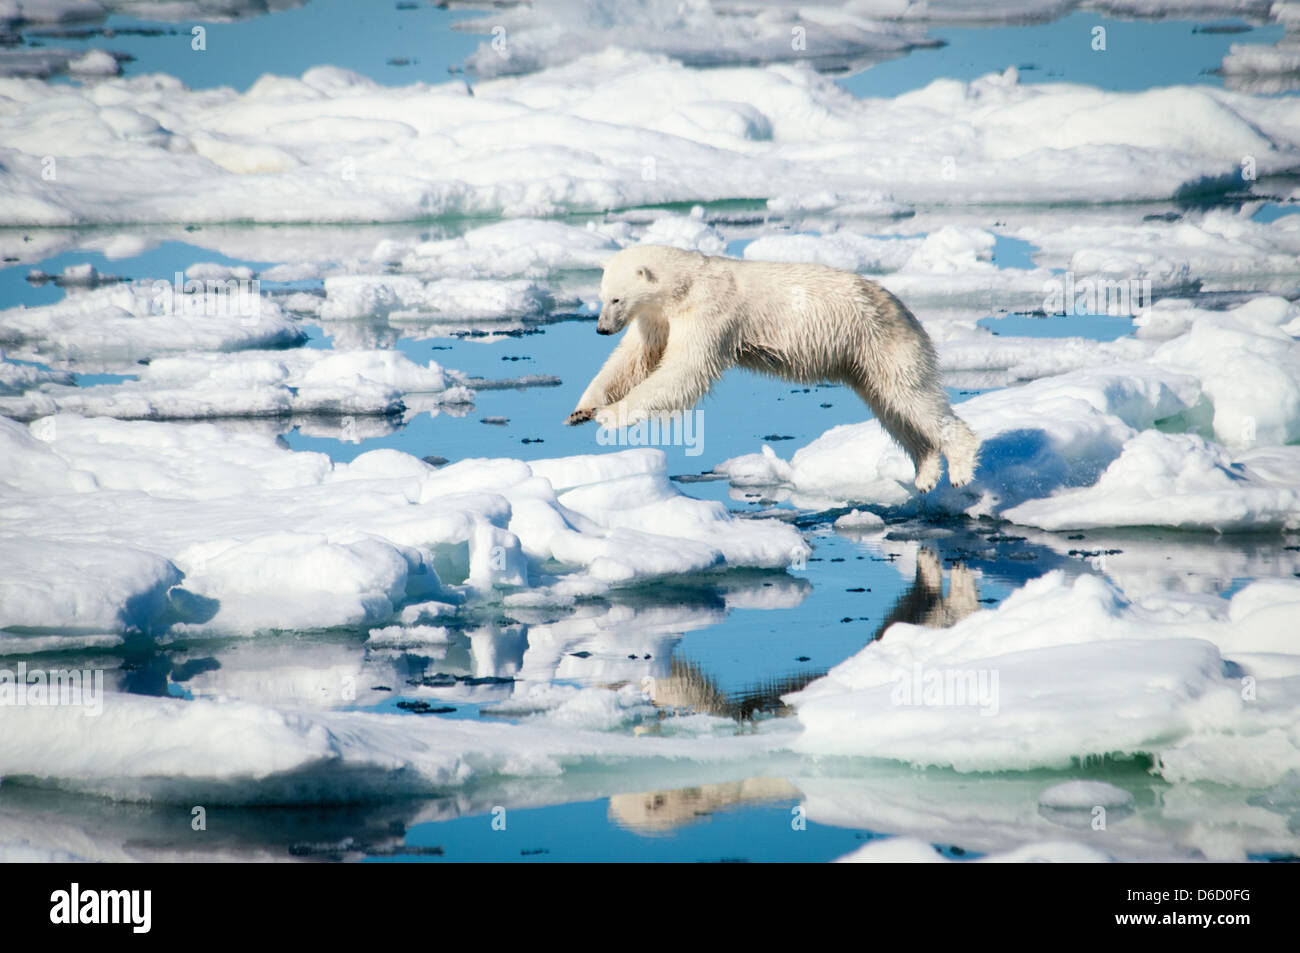 Polar Bear, Ursus maritimus, leaping over melting ice in the Olgastretet Pack Ice, Svalbard Archipelago, Norway - Stock Image